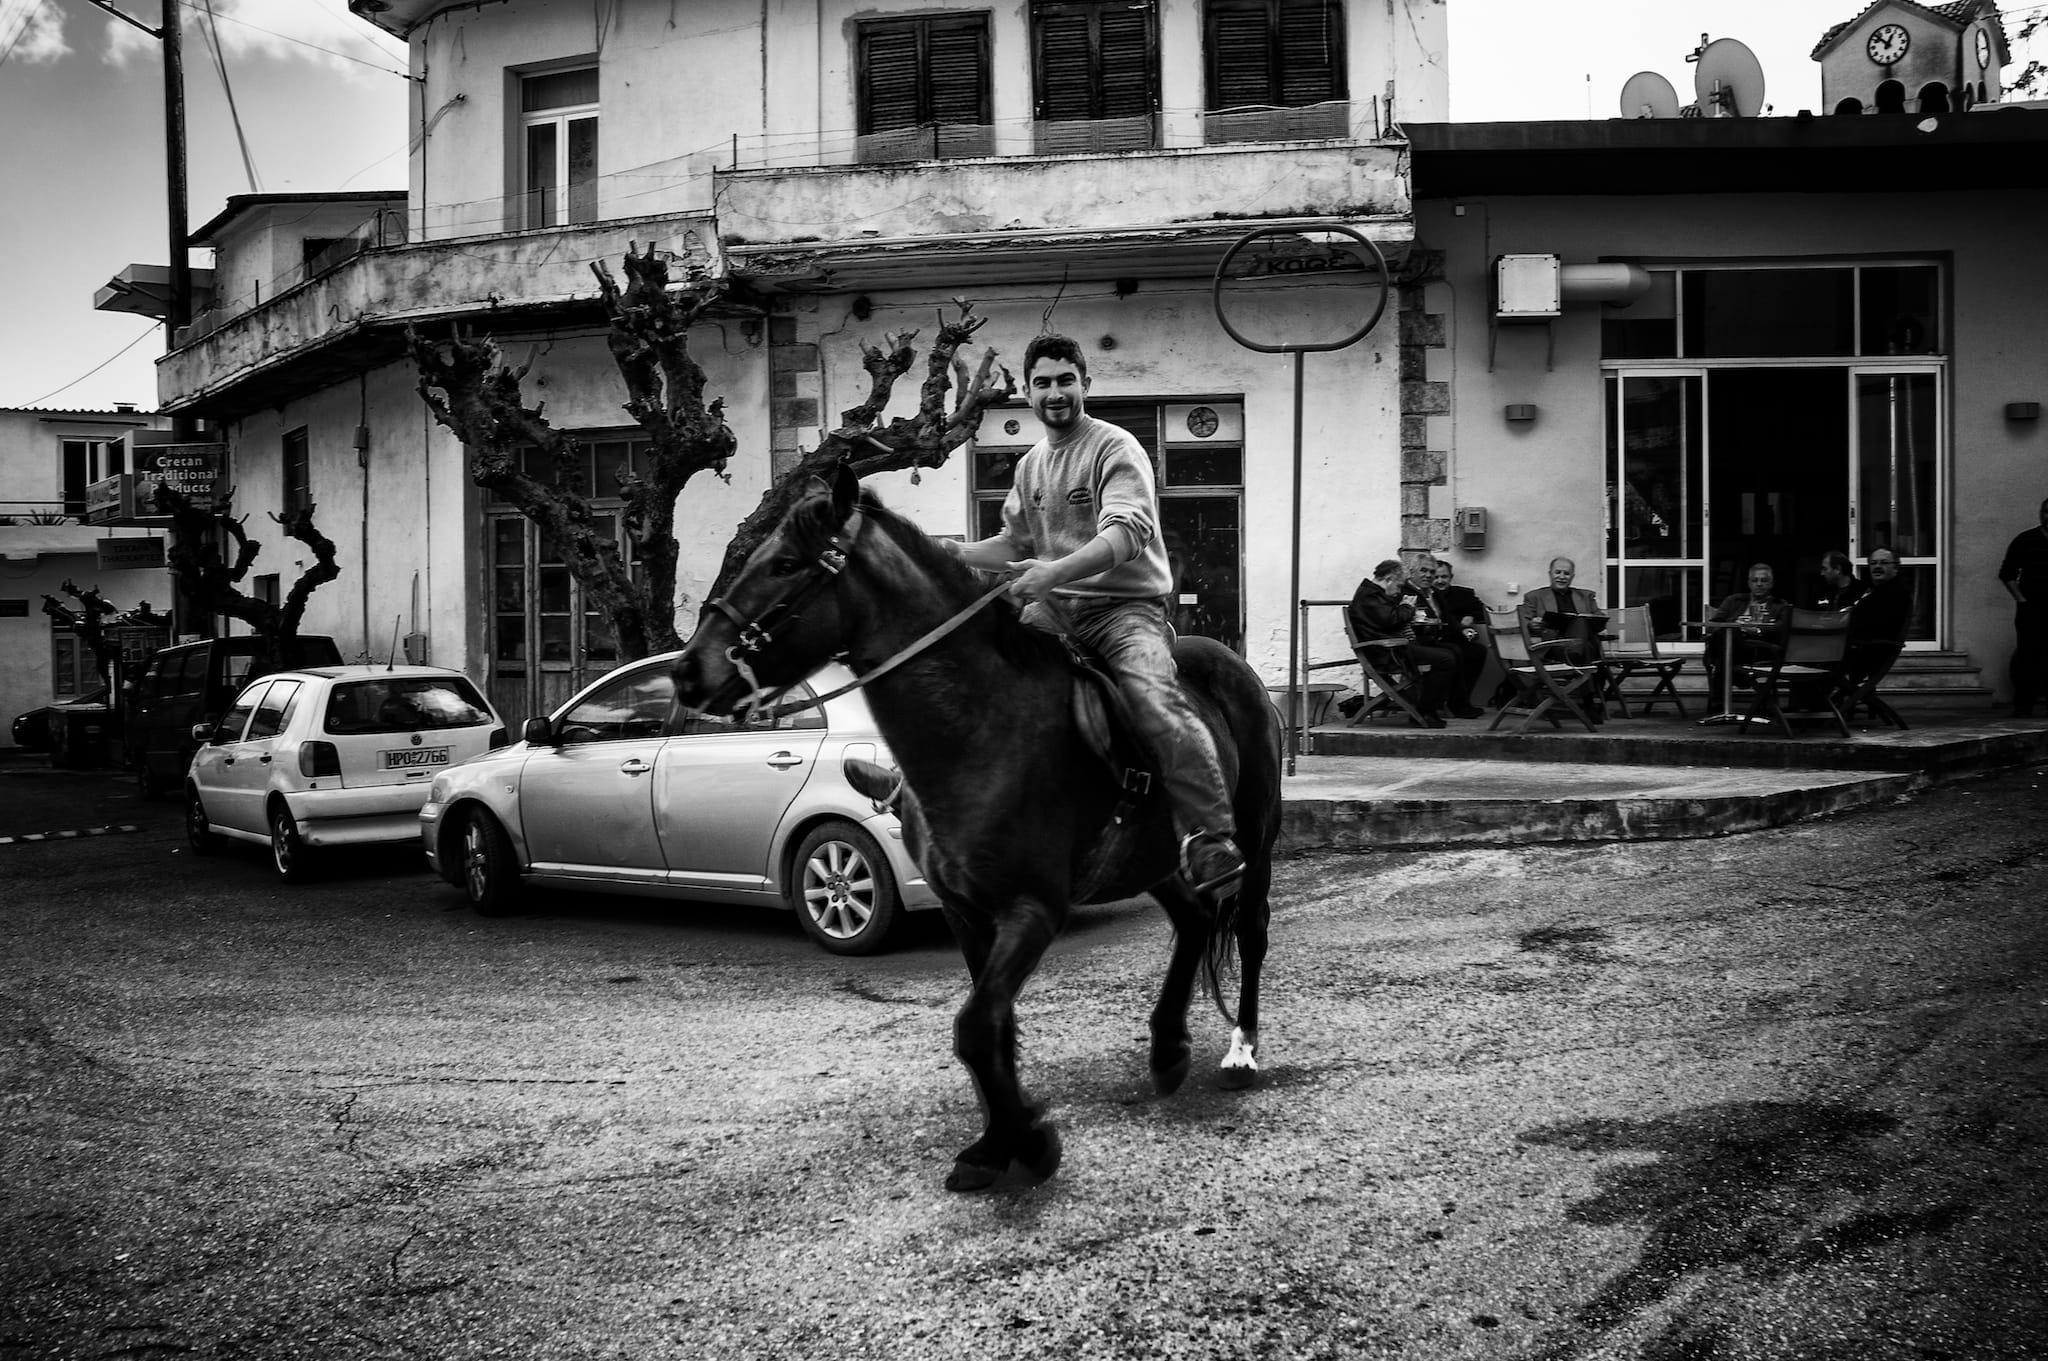 The Rider of Melidoni